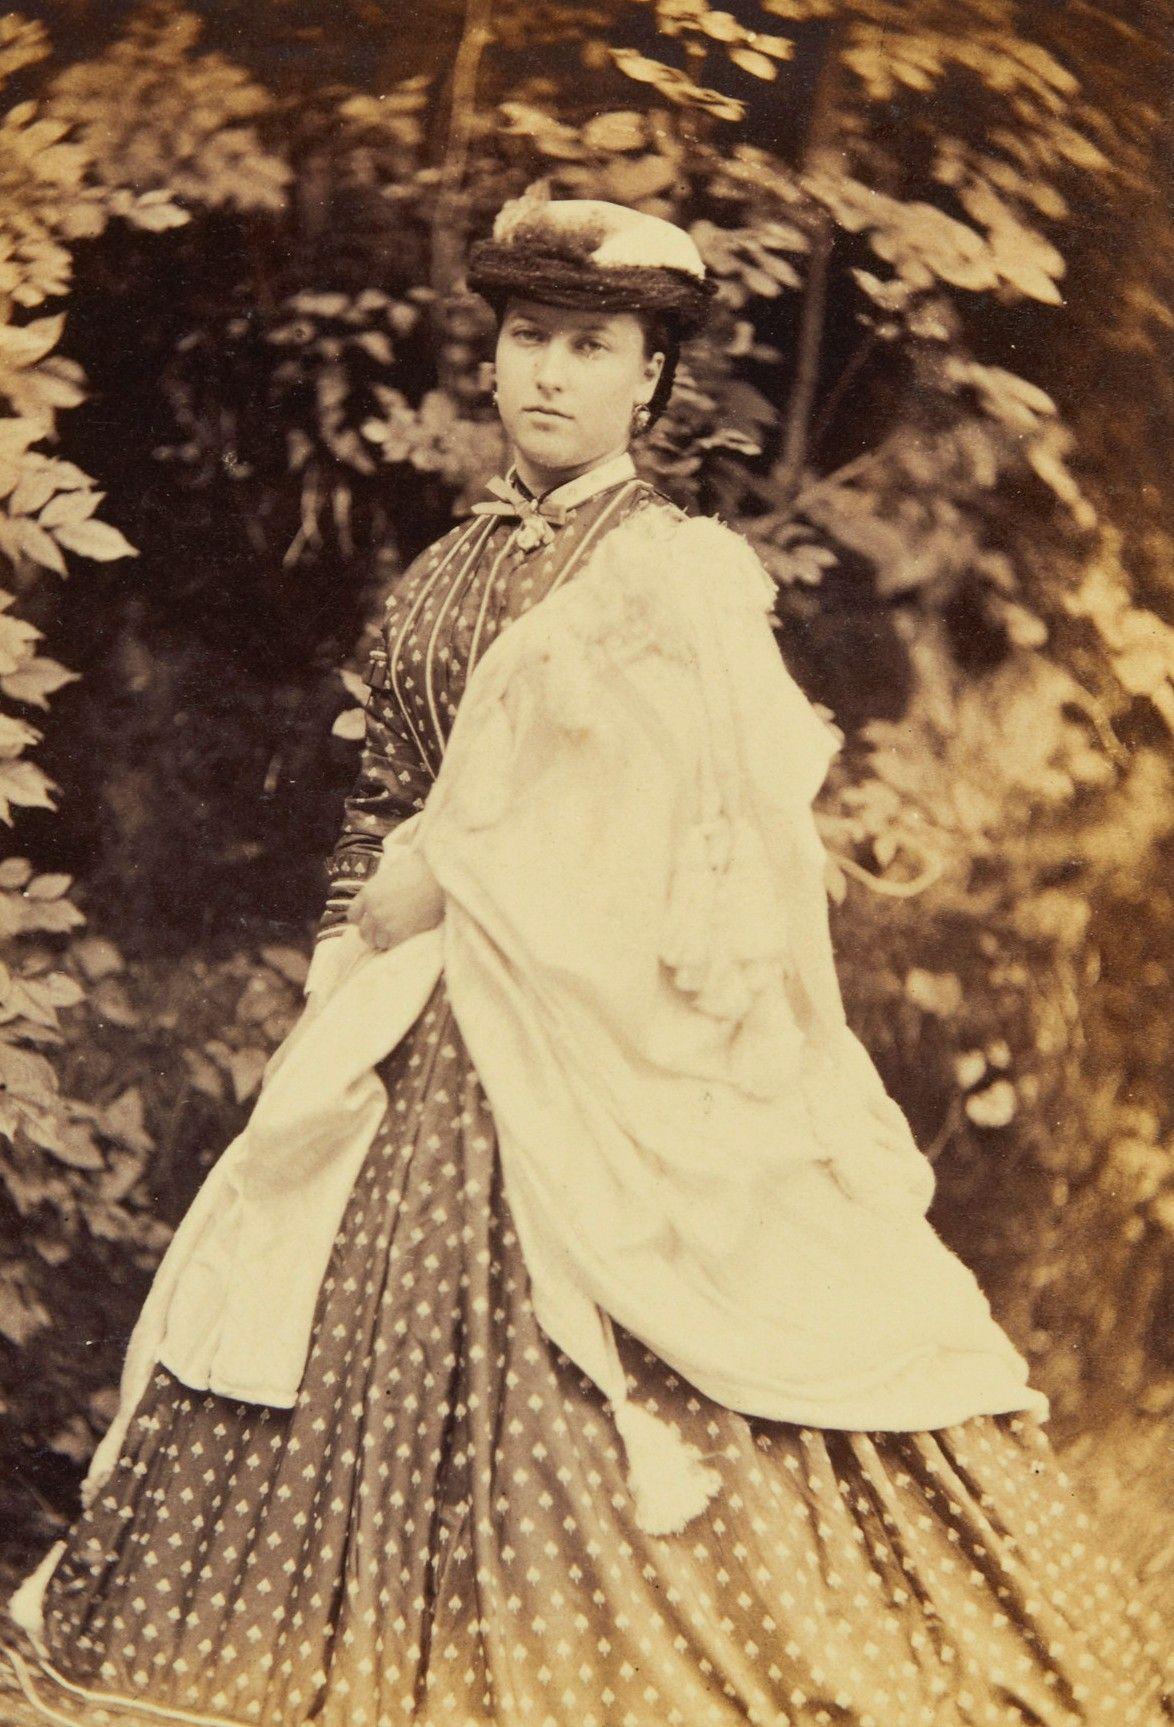 Princess Helena of the United Kingdom, August 1865. Aged